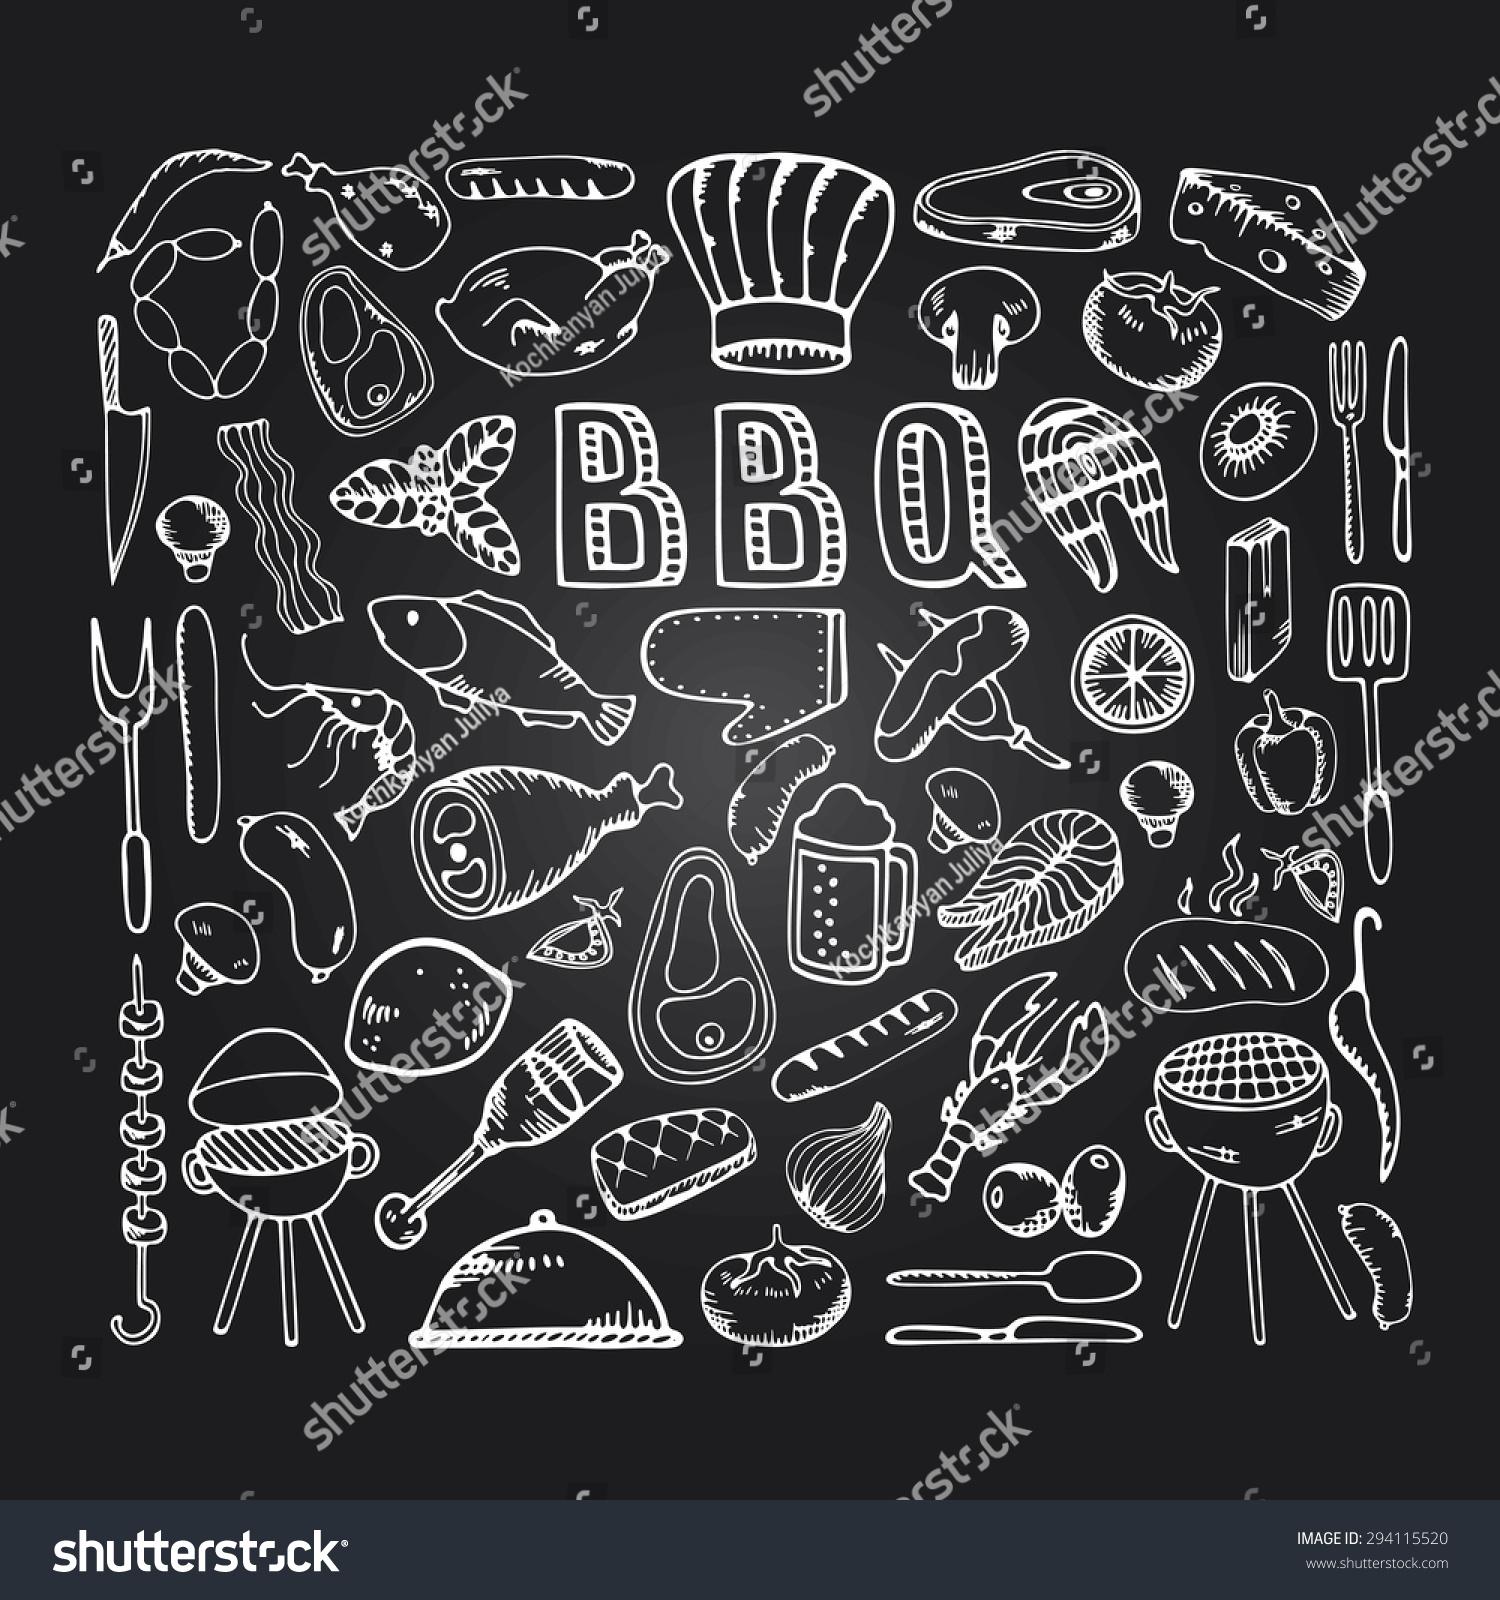 Barbecue Grill Partycook Idea Food Design Stock Vector Royalty Free 294115520